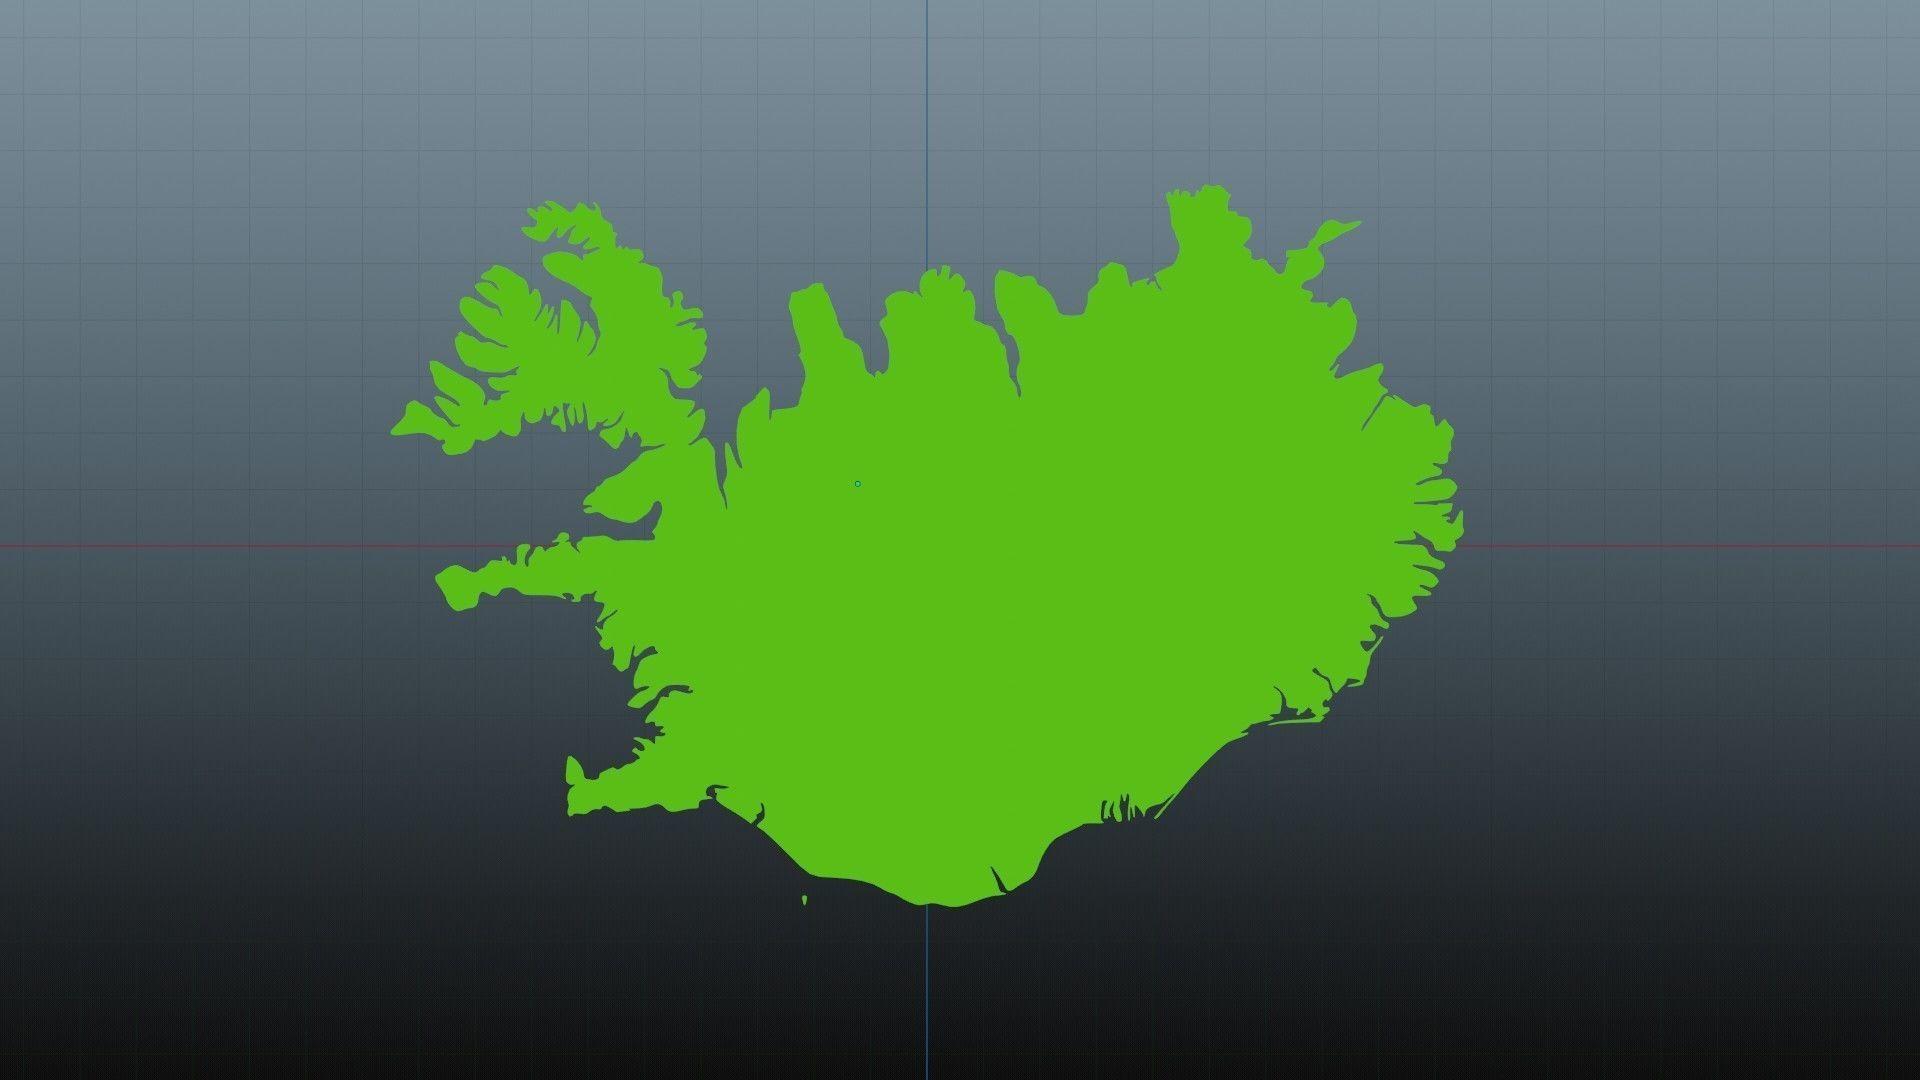 Iceland map symbol